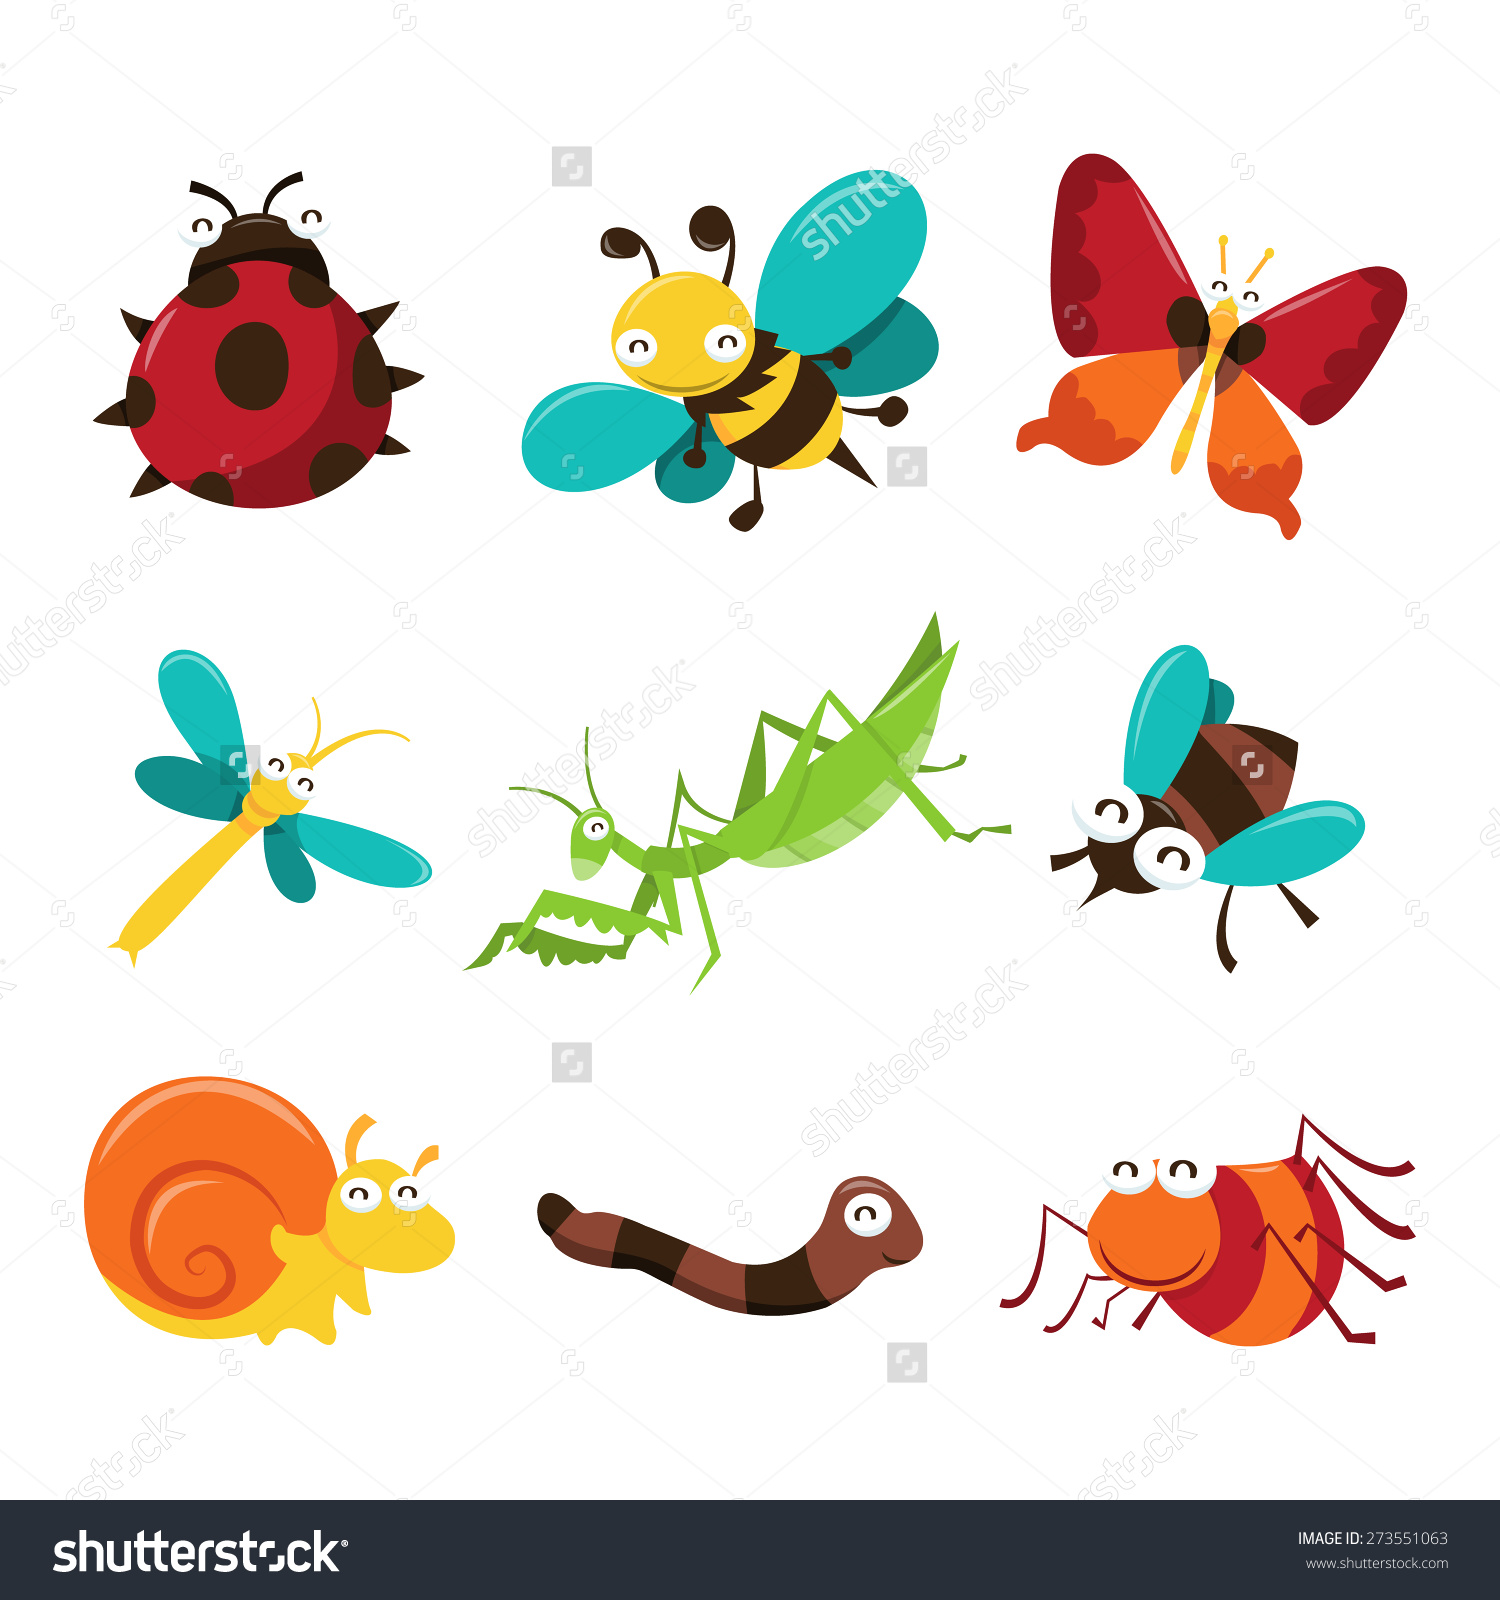 Cartoon Vector Illustration Cute Happy Bugs Stock Vector 273551063.